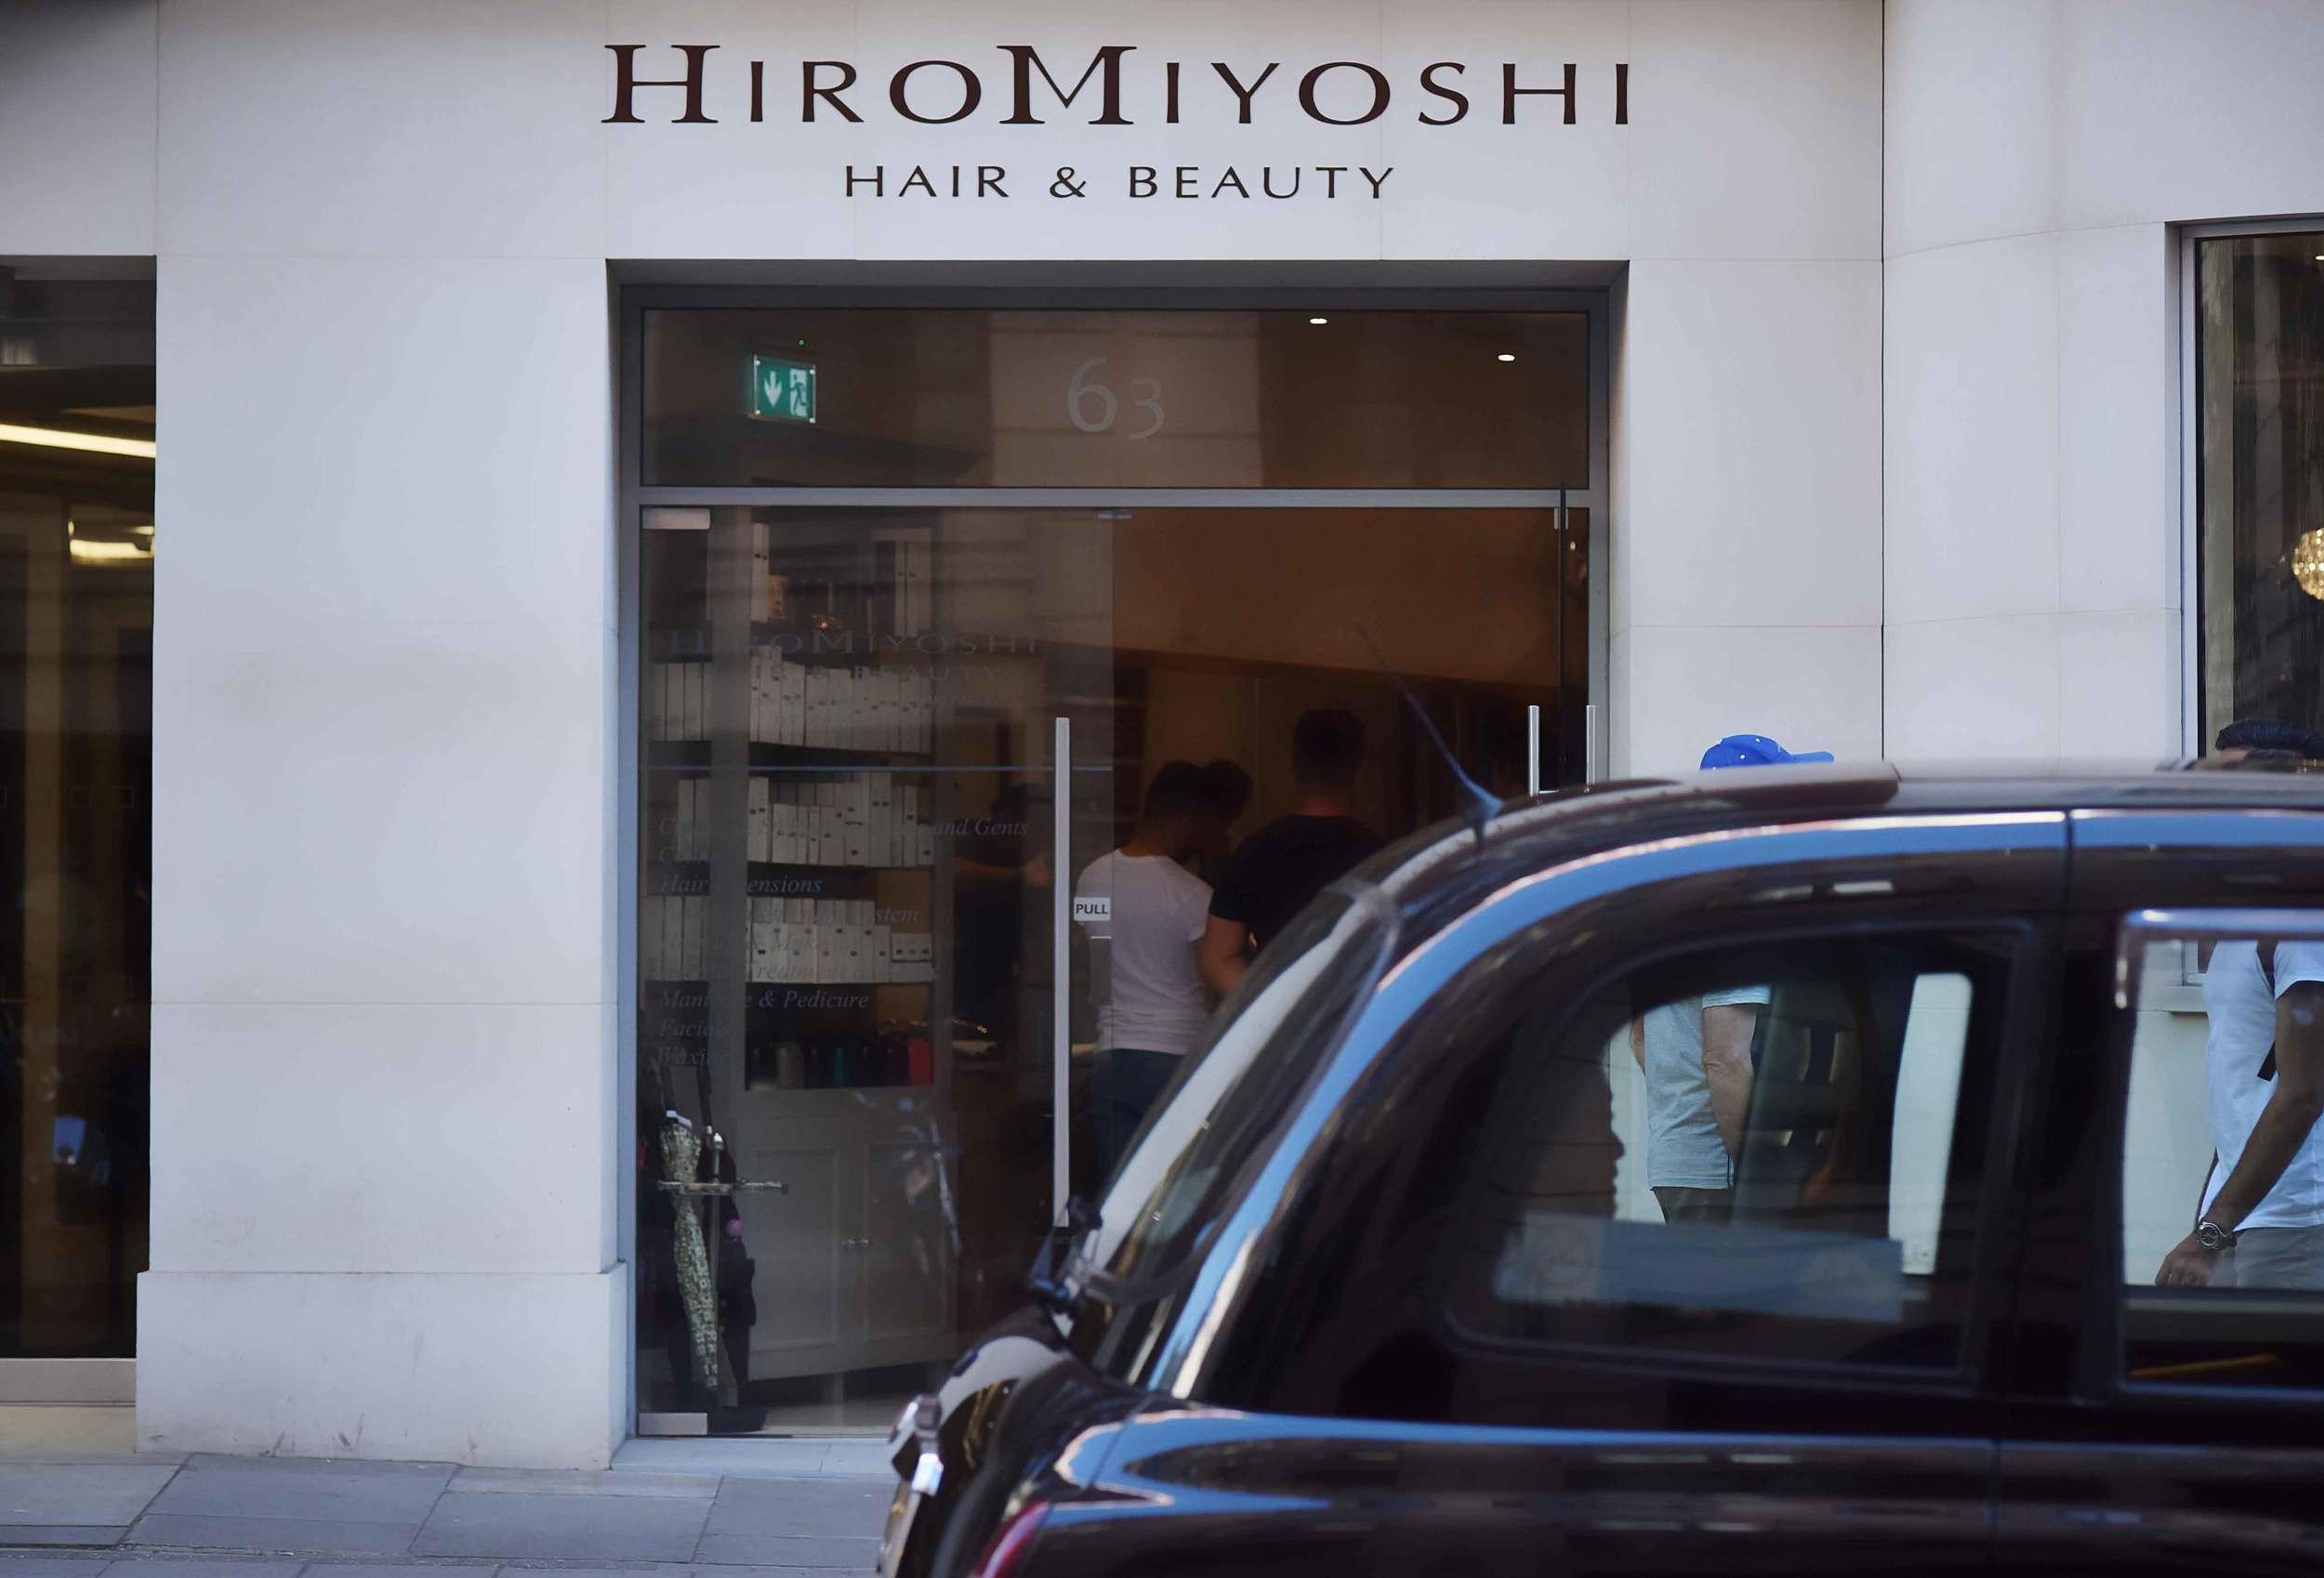 Hiro Miyoshi salon, Mayfair, London, UK. Image©sourcingstyle.com